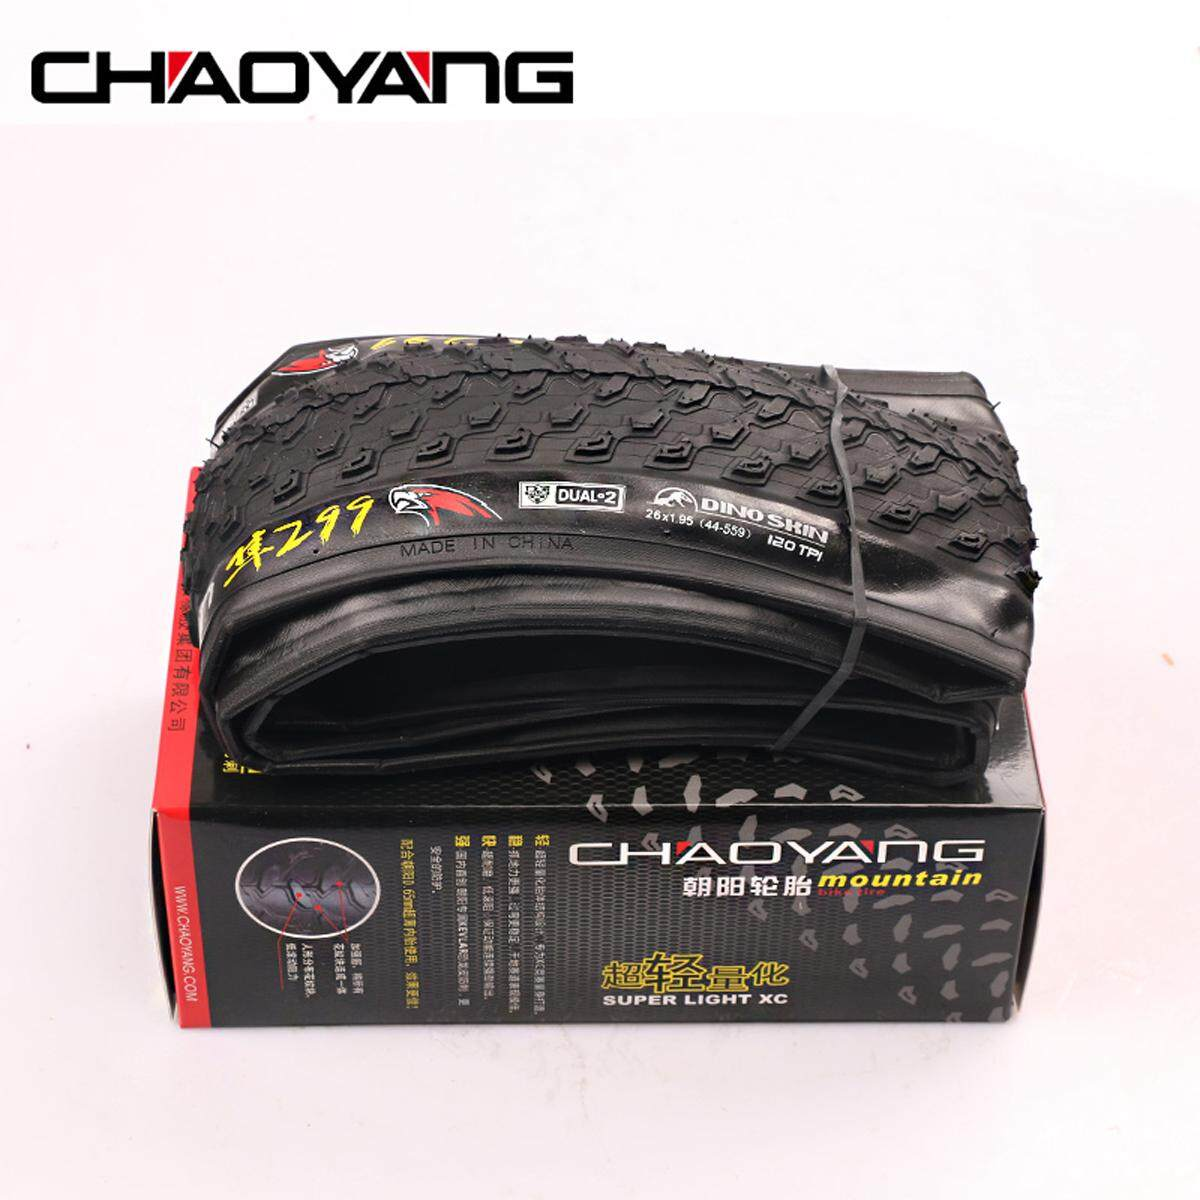 Foldable Mtb Mountain Bike Bicycle Tyre 26 29 27.5x1.95 Ultralight Tire Size 27.5*1.95 - Intl By Audew.